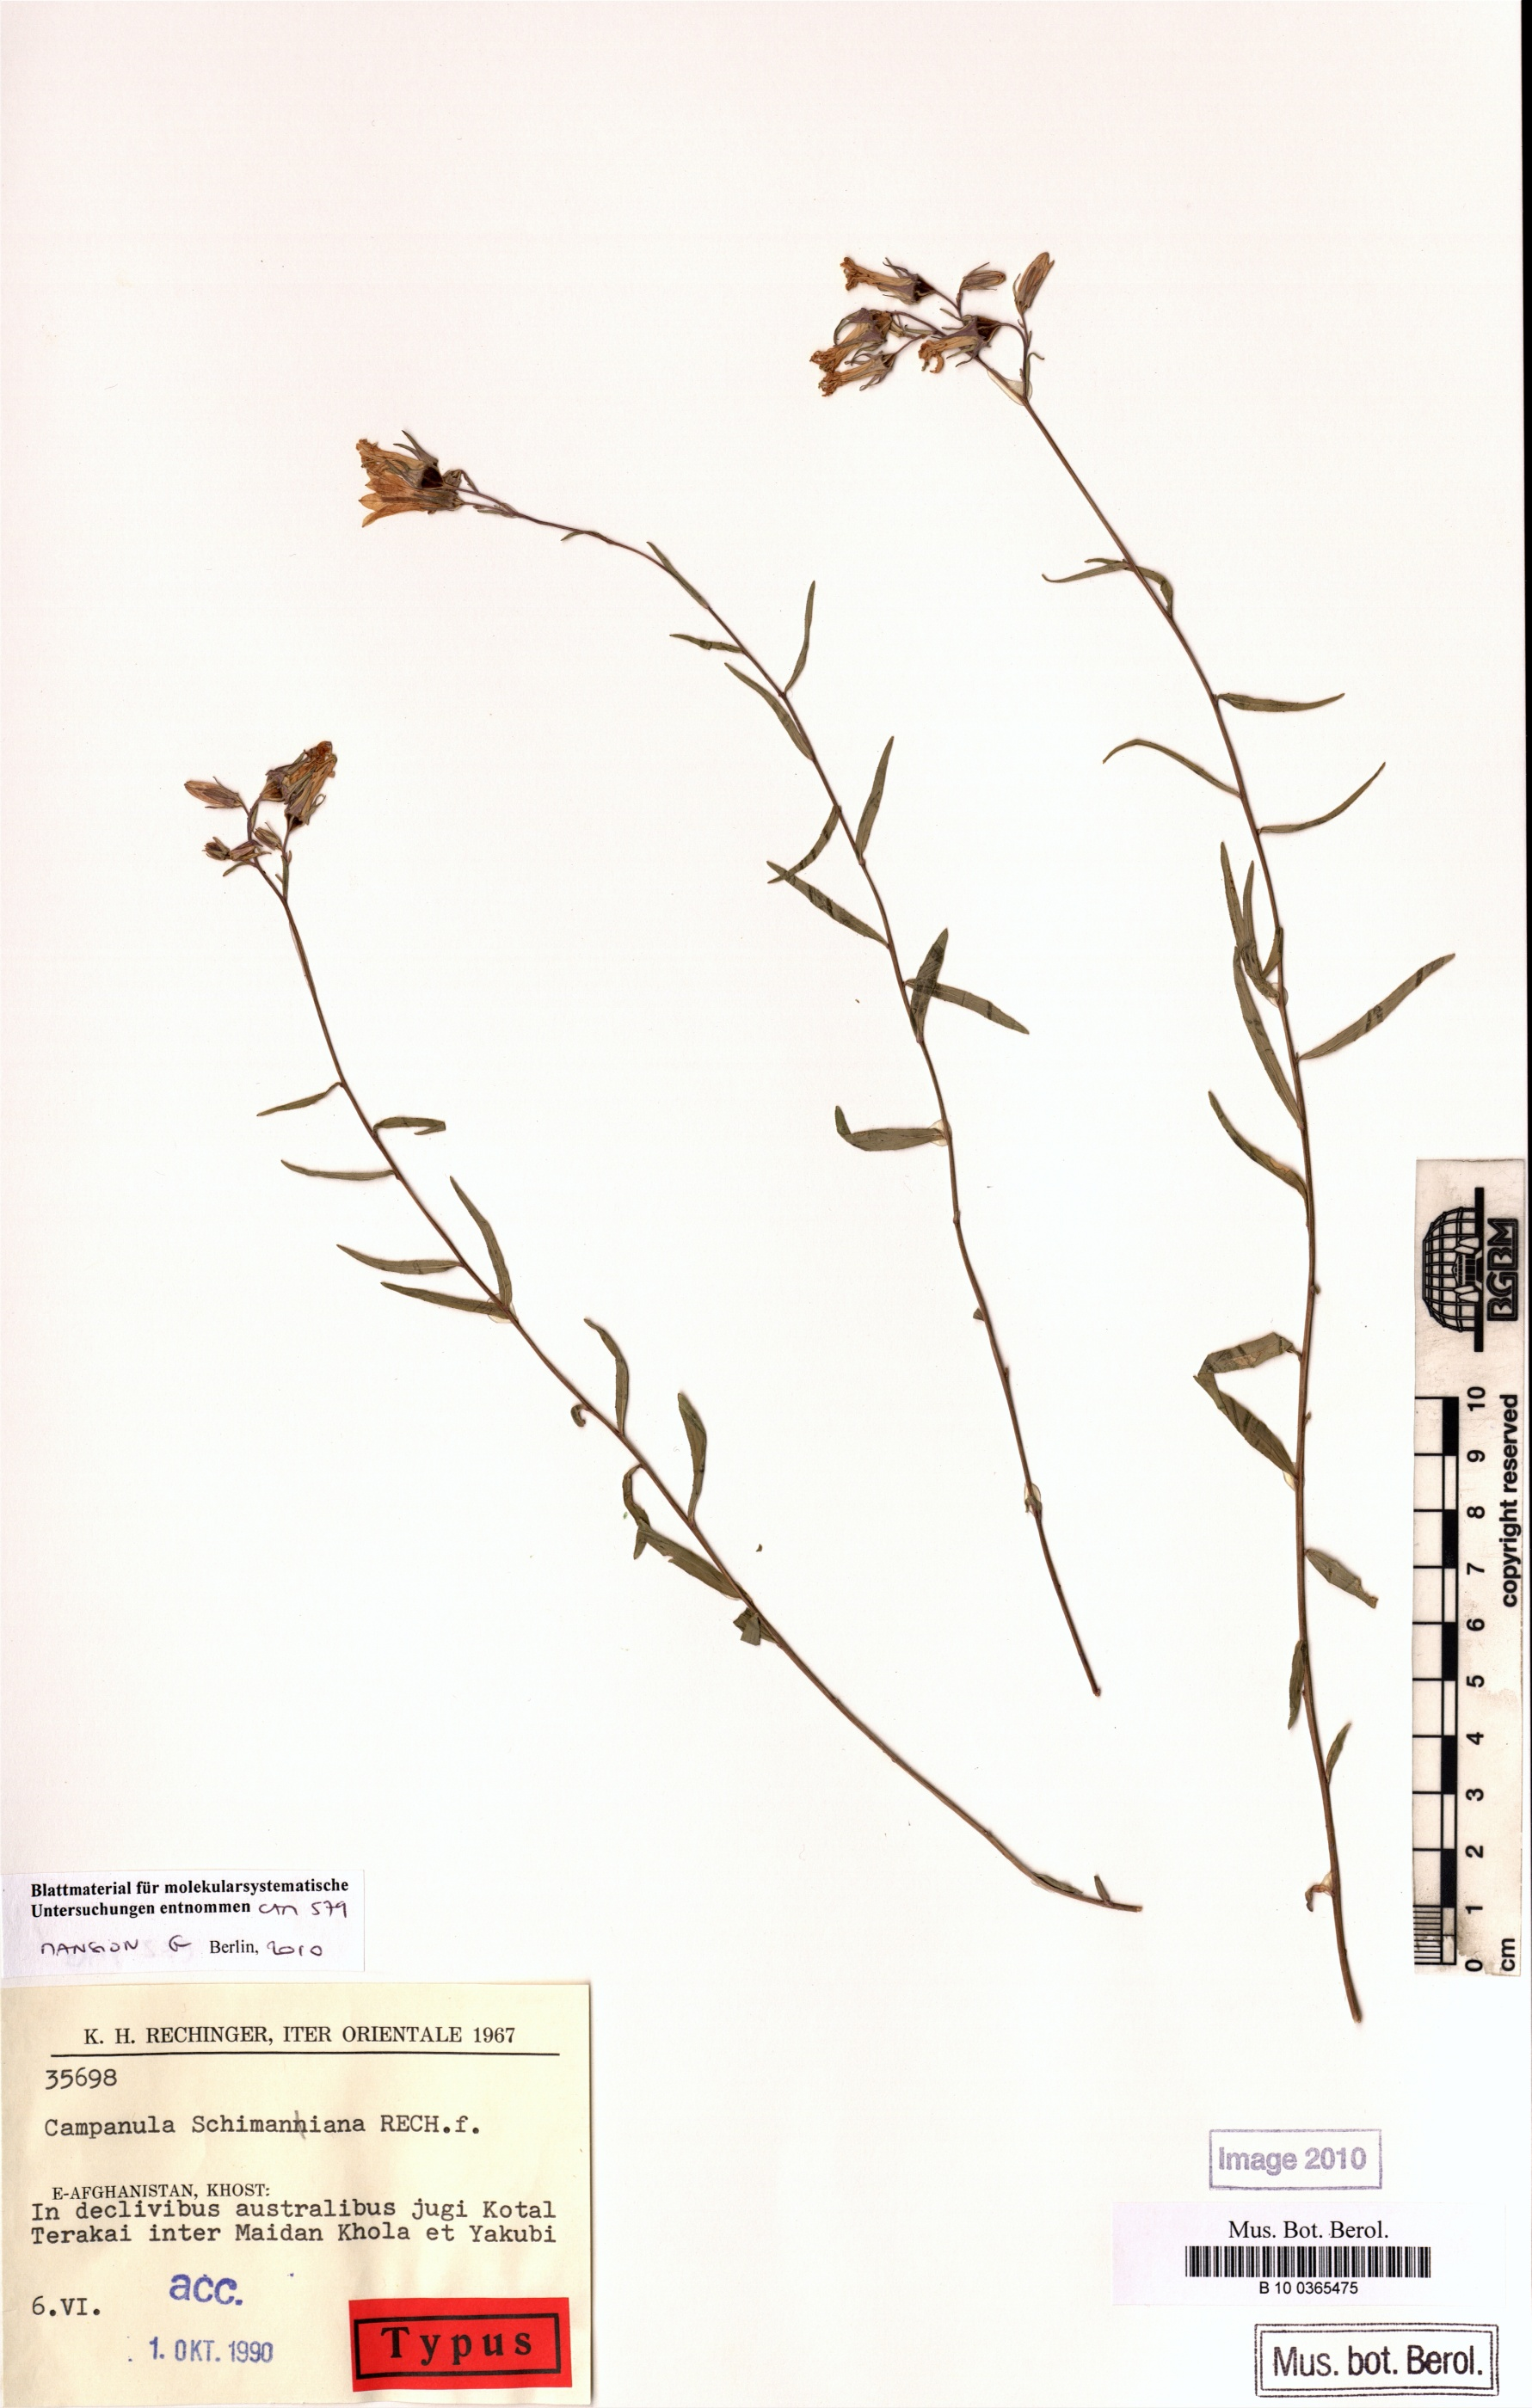 http://ww2.bgbm.org/herbarium/images/B/10/03/65/47/b_10_0365475.jpg